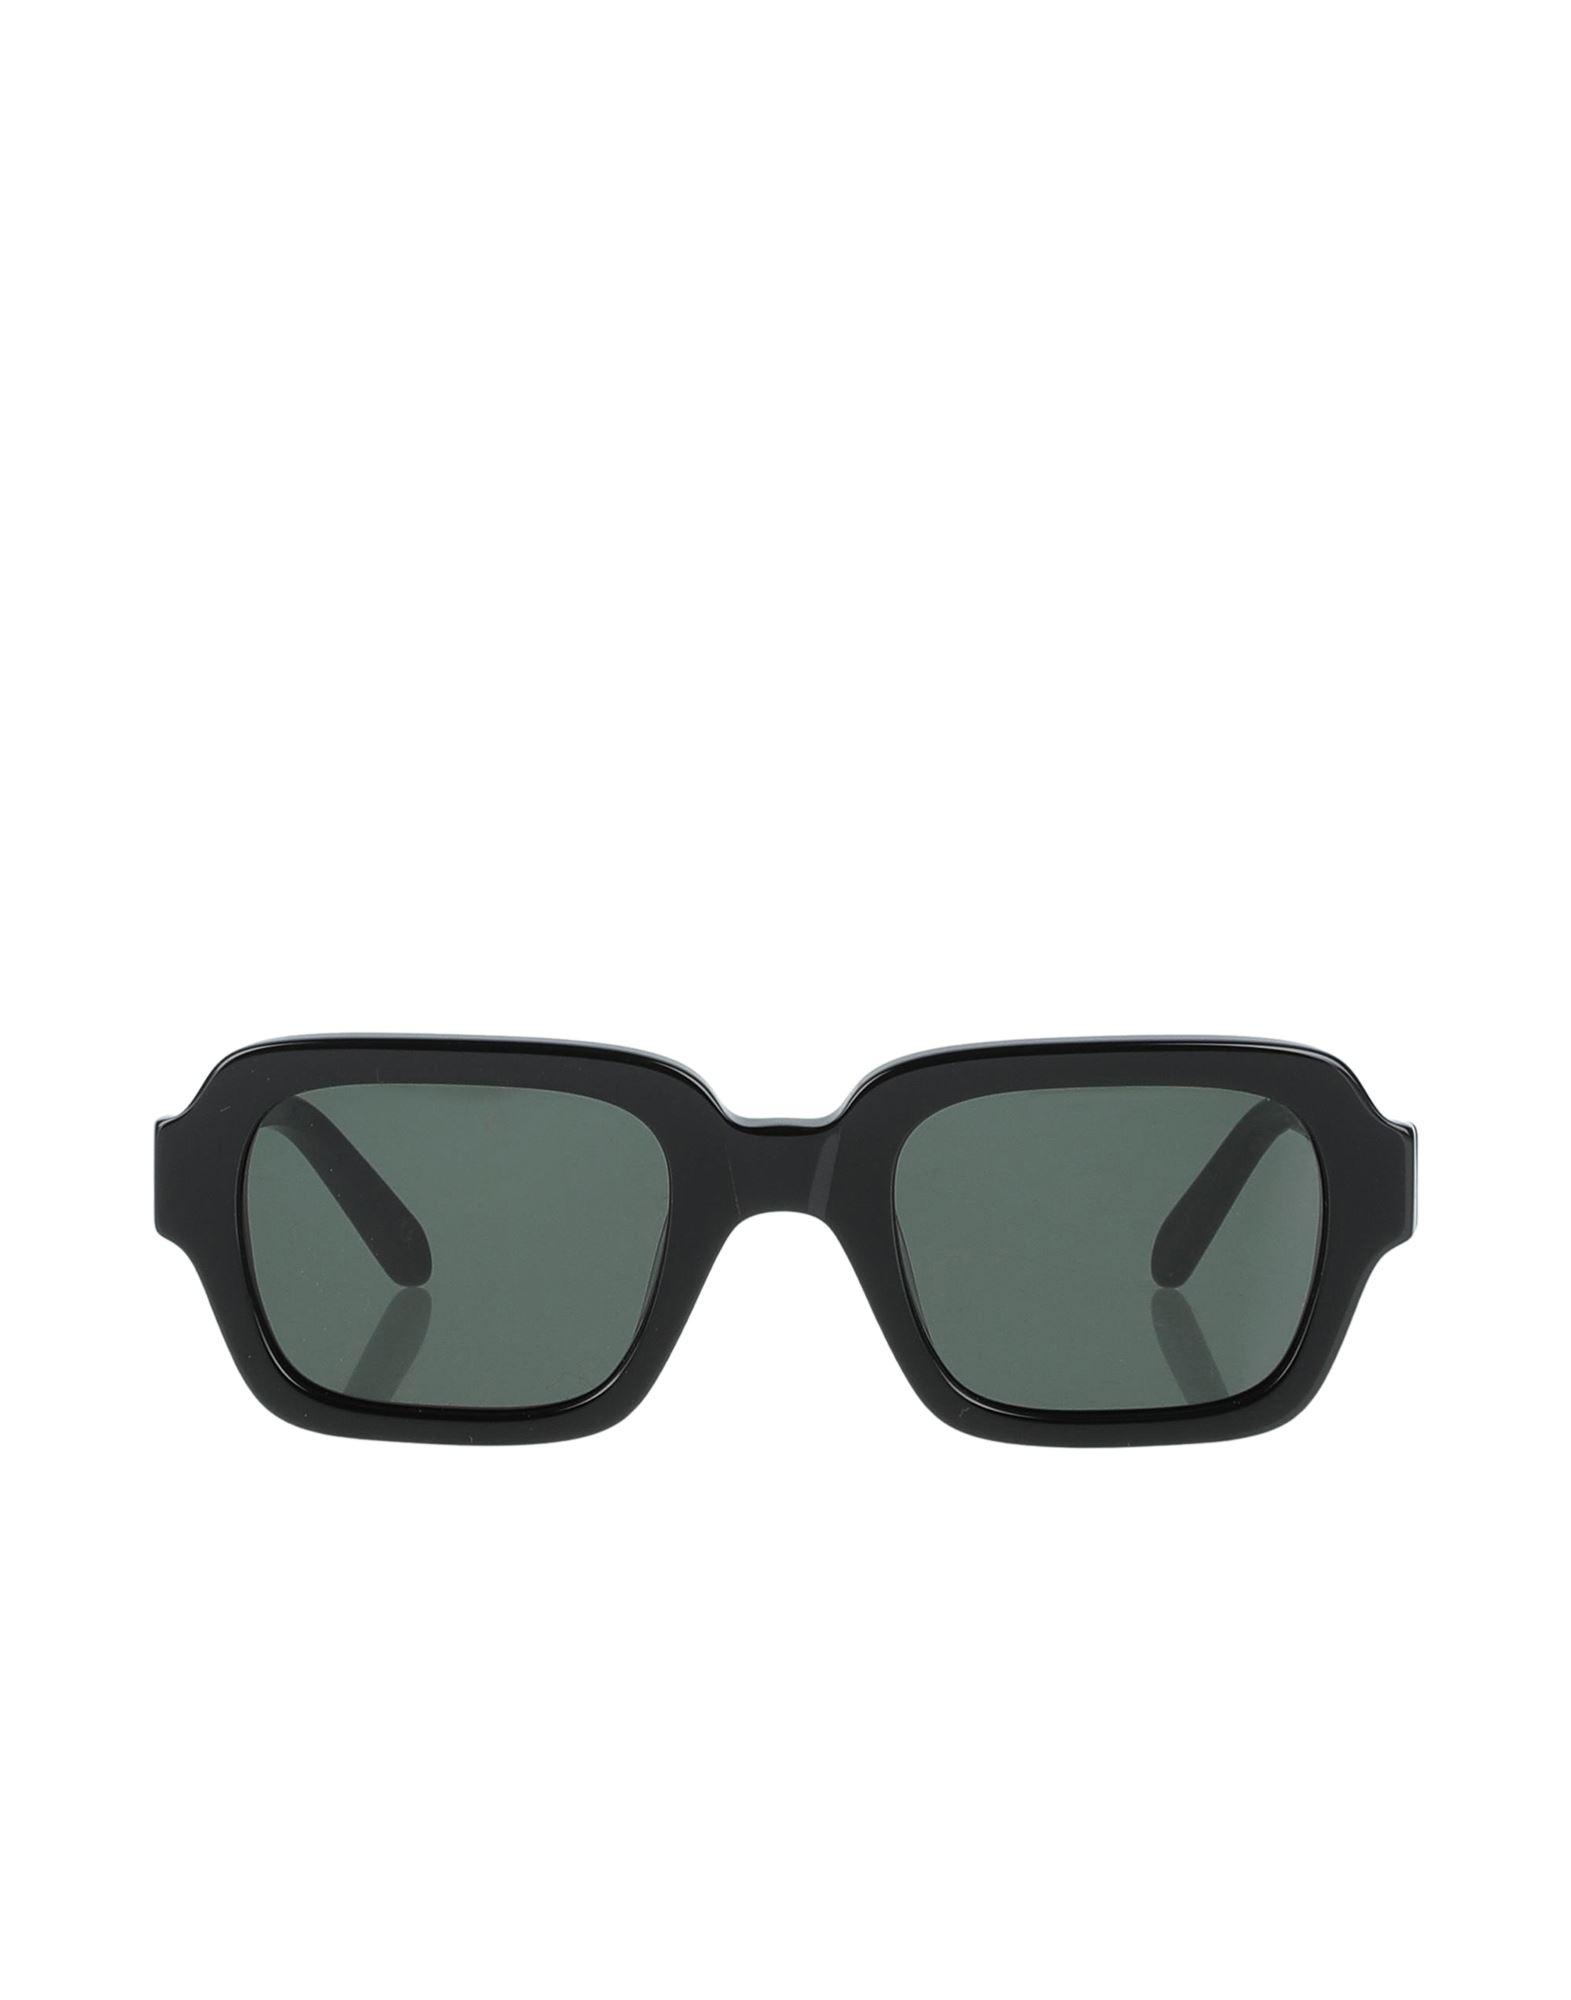 HAN KJØBENHAVN Sunglasses - Item 46745062